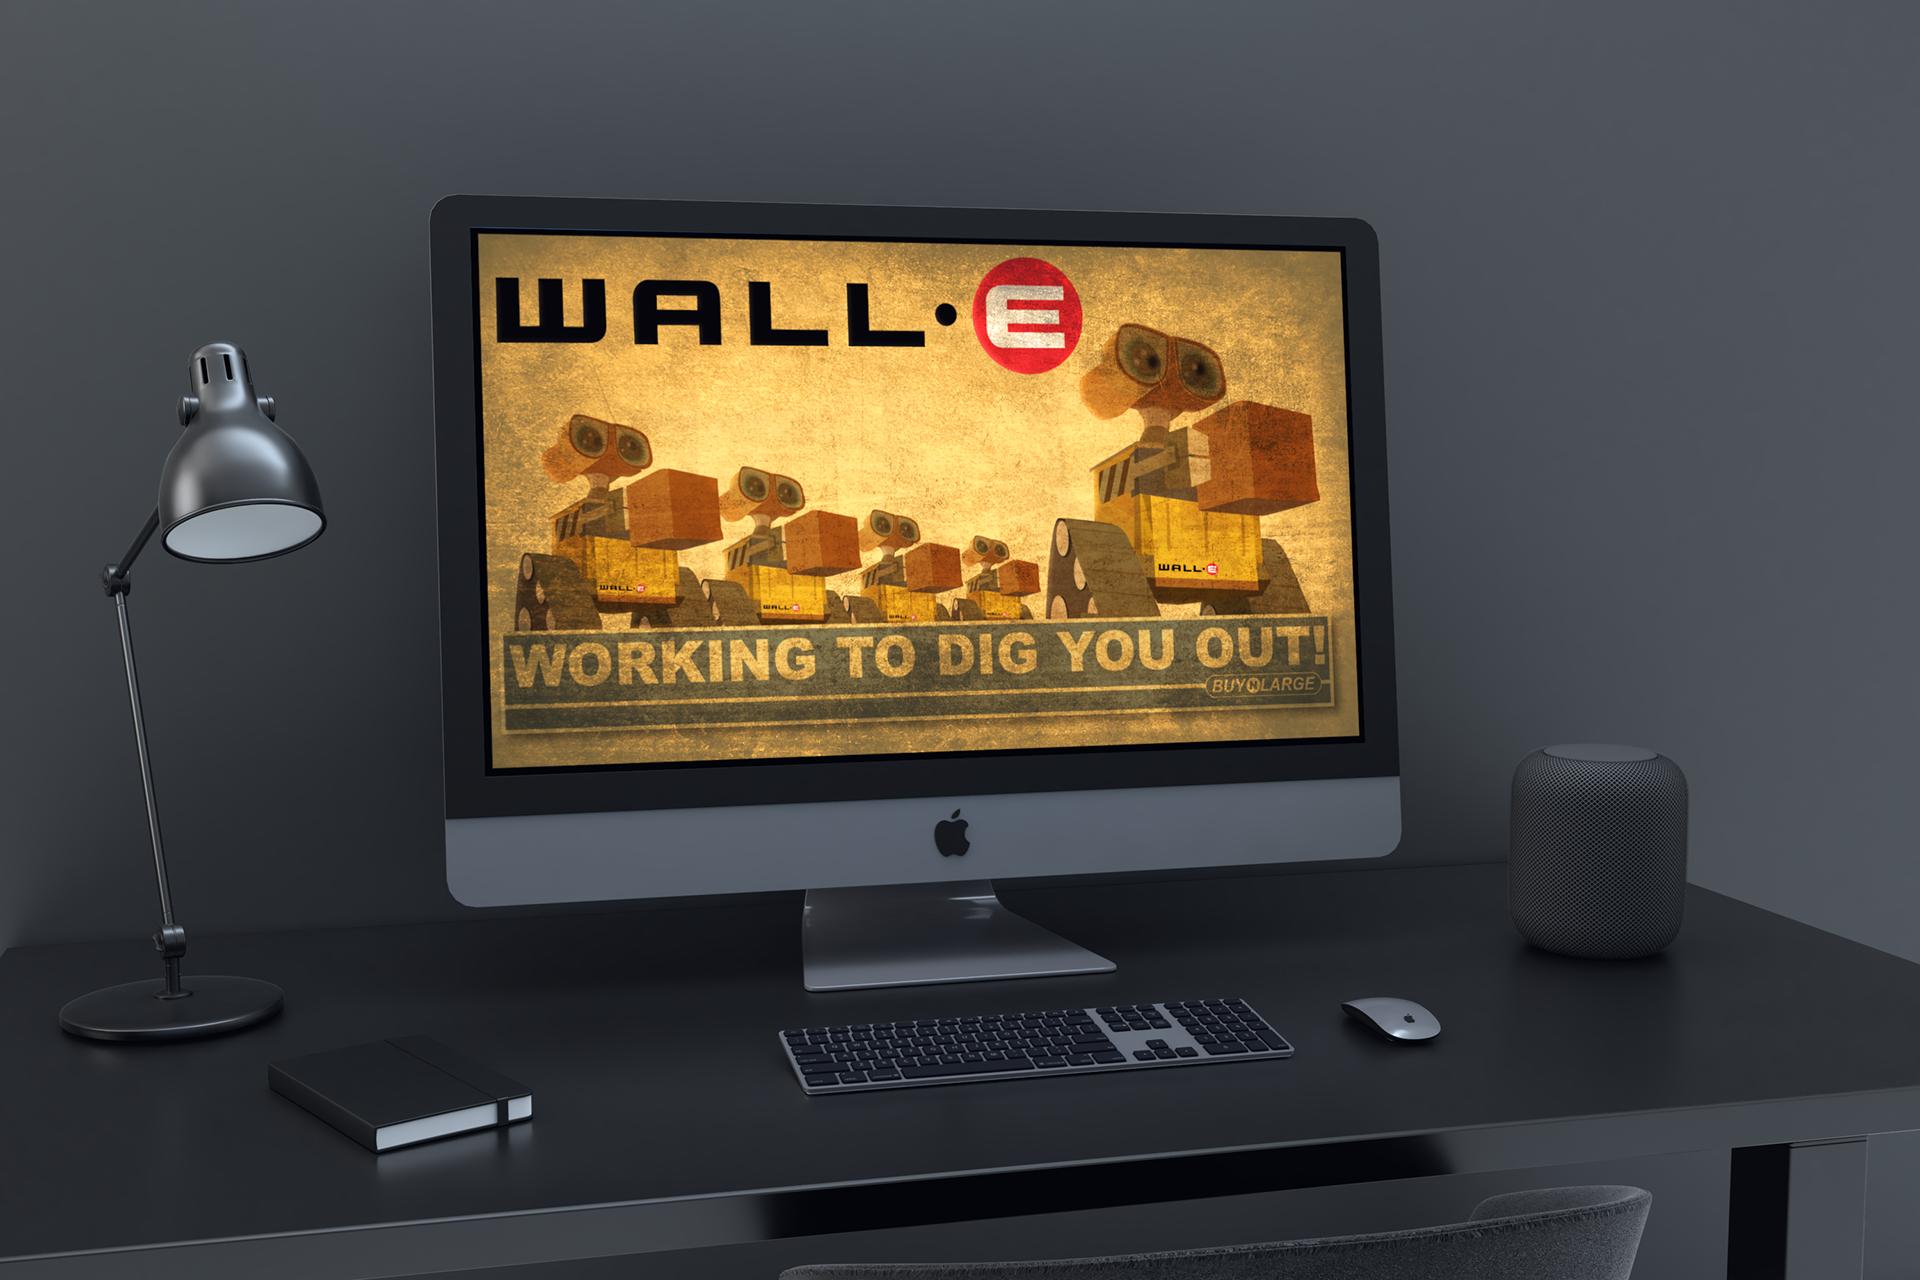 Joshua Russell Wall E Wallpaper